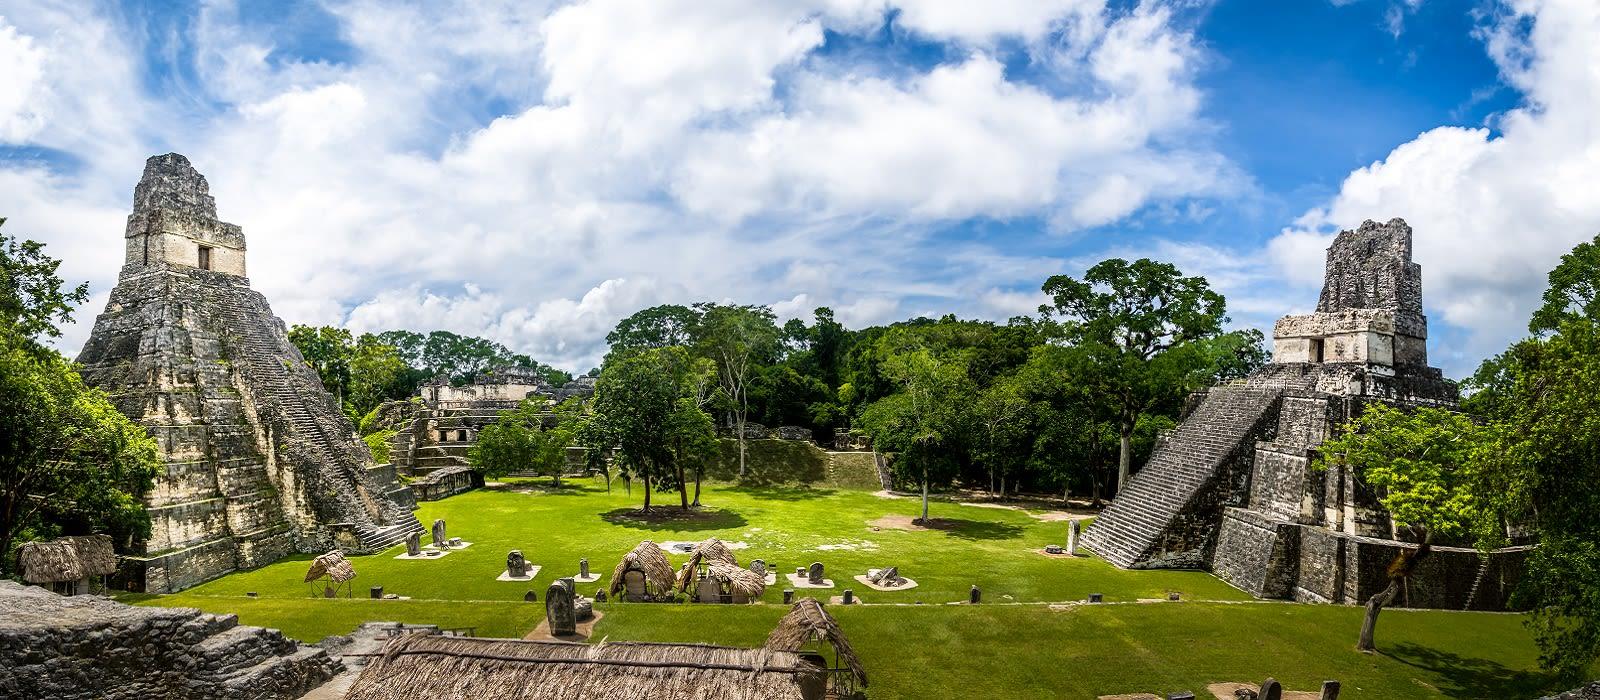 Exotische Vögel & Bezaubernde Landschaften – Vogelbeobachtung in Guatemala Urlaub 4